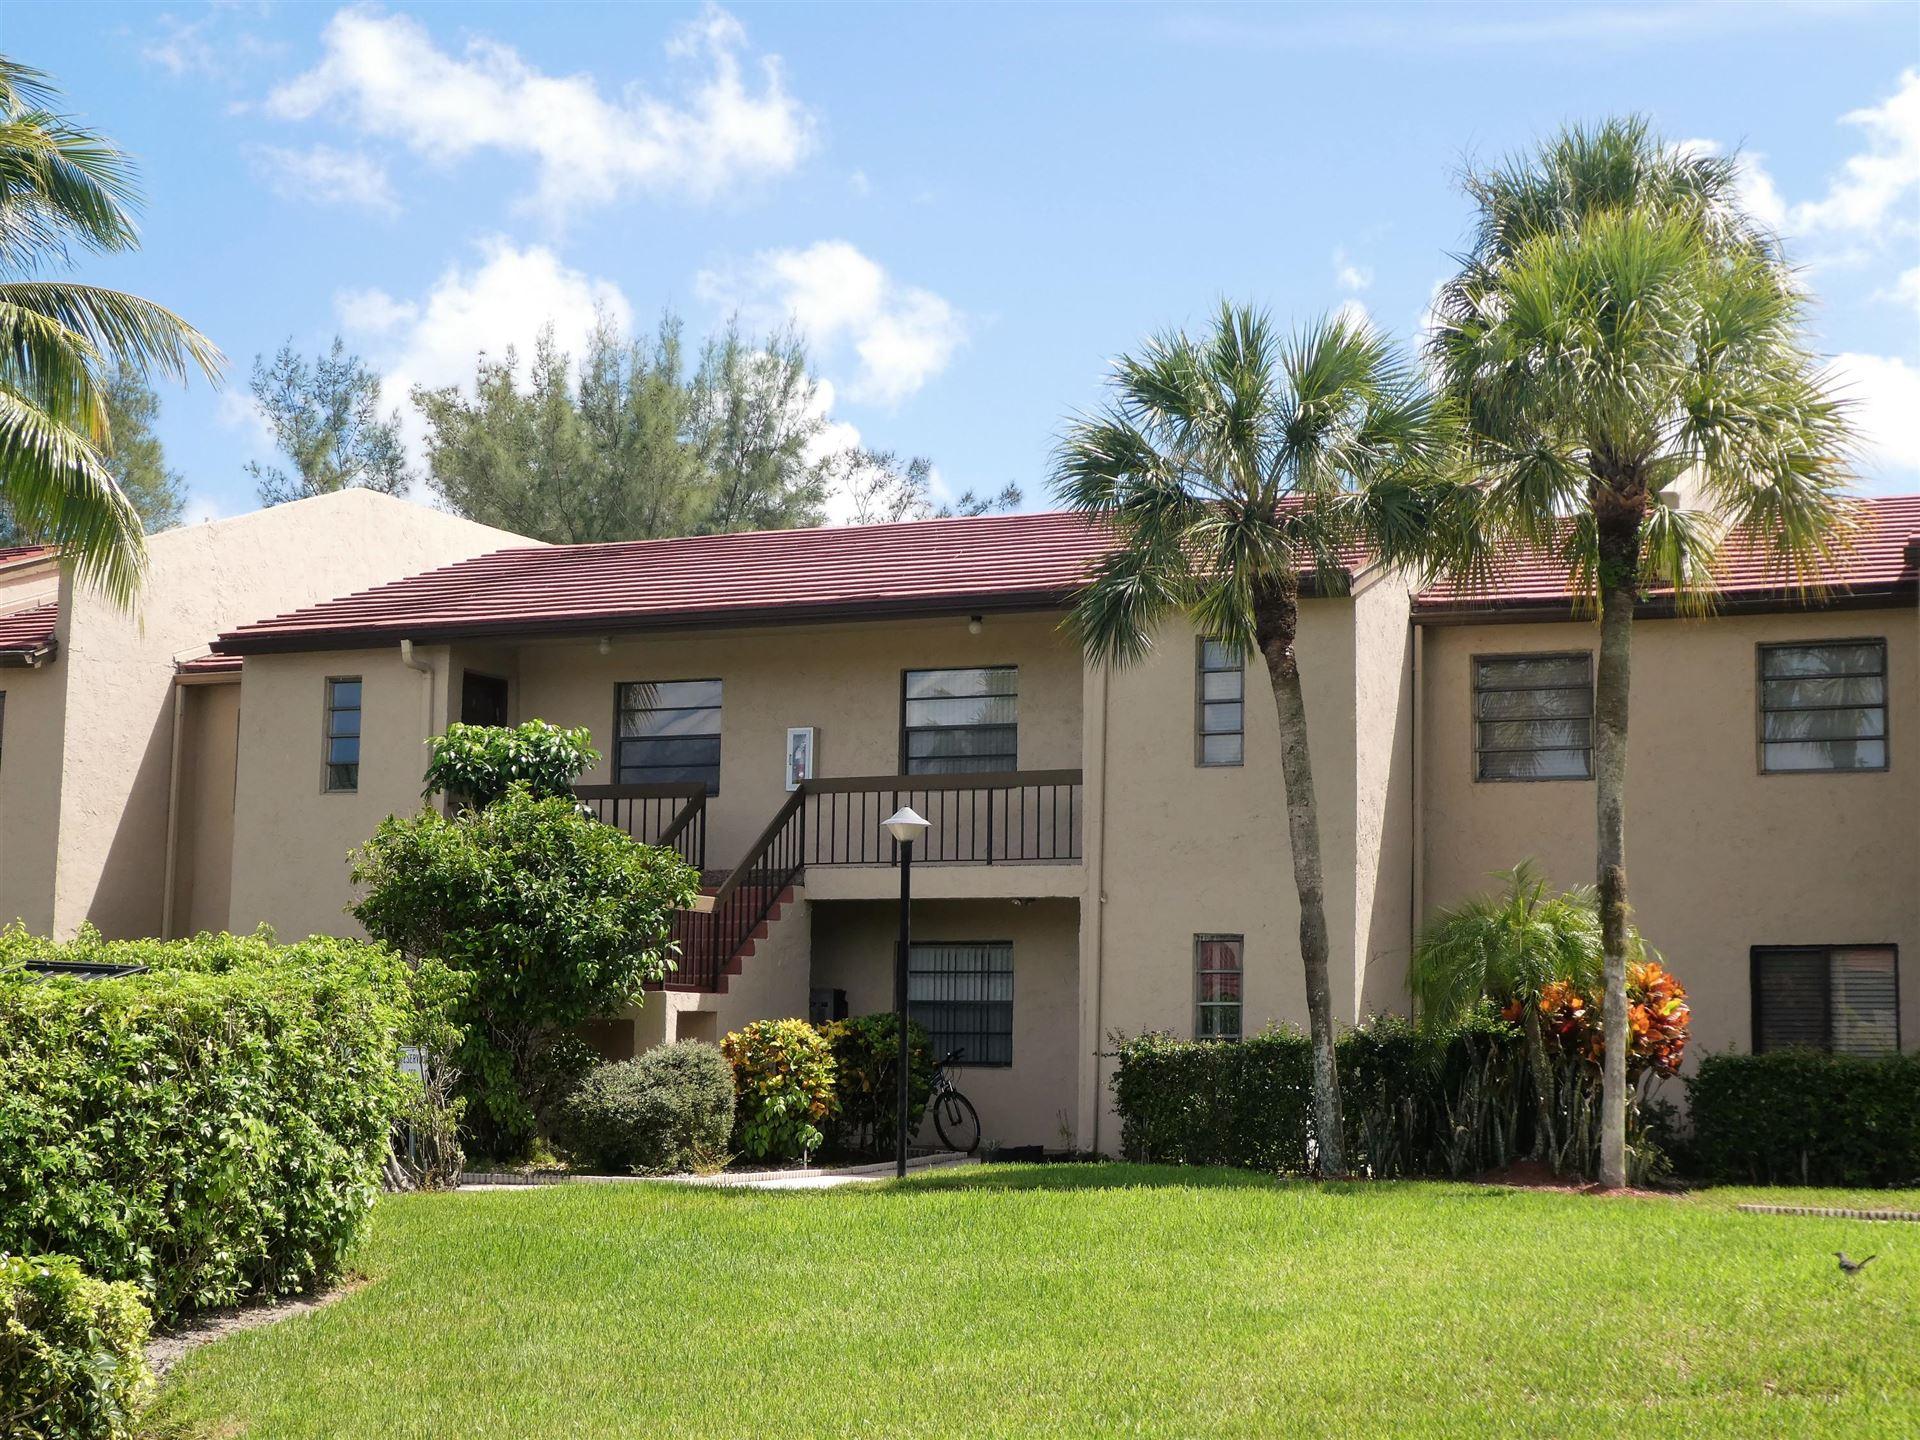 8410 Casa Del Lago #G, Boca Raton, FL 33433 - #: RX-10607972